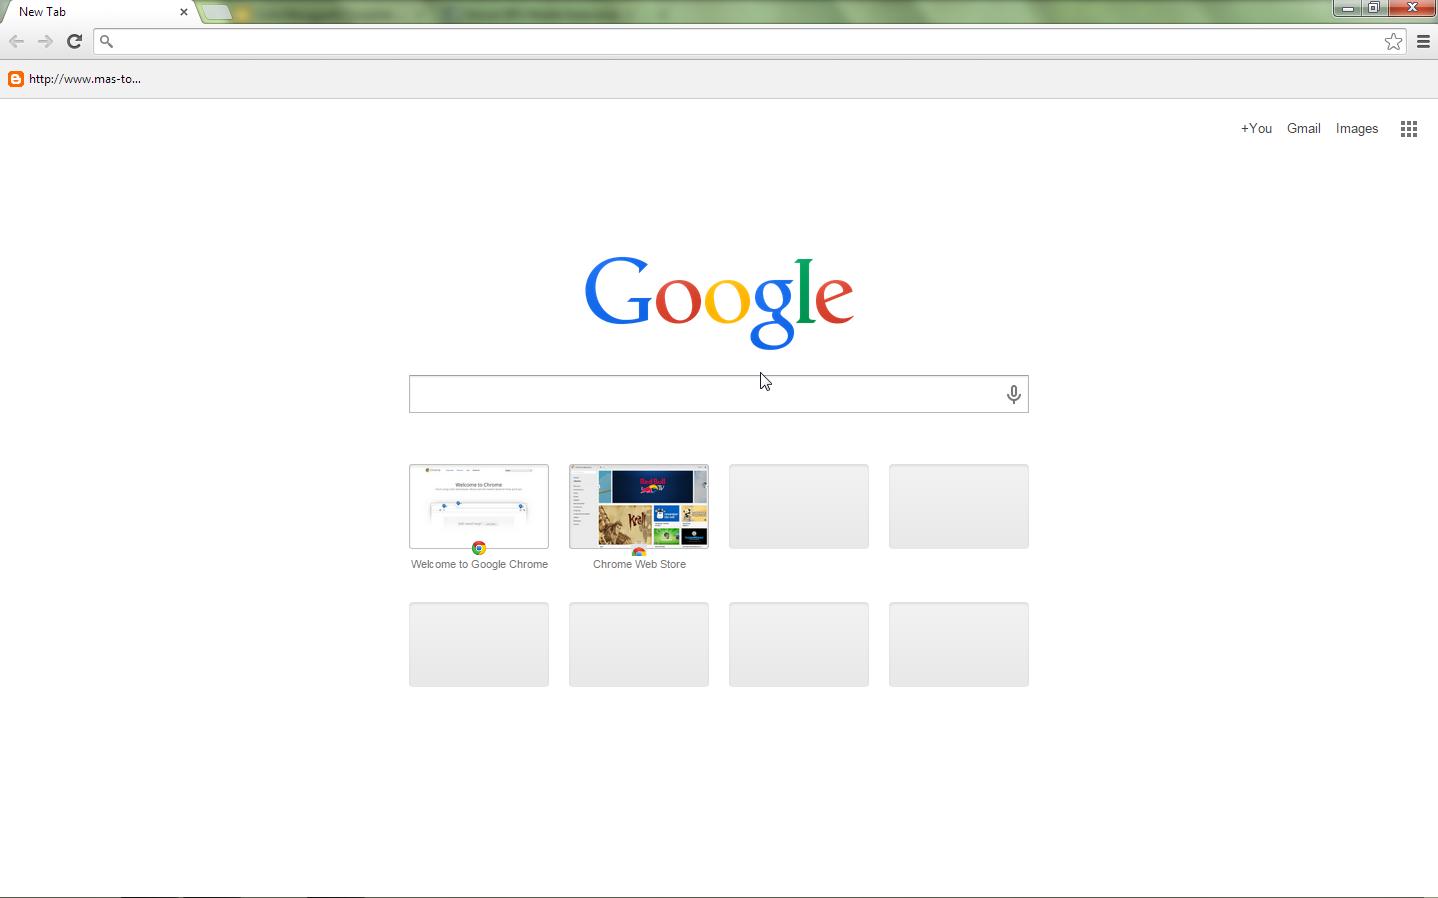 cara ubah tampilan google chrome seperti semula (defoult)